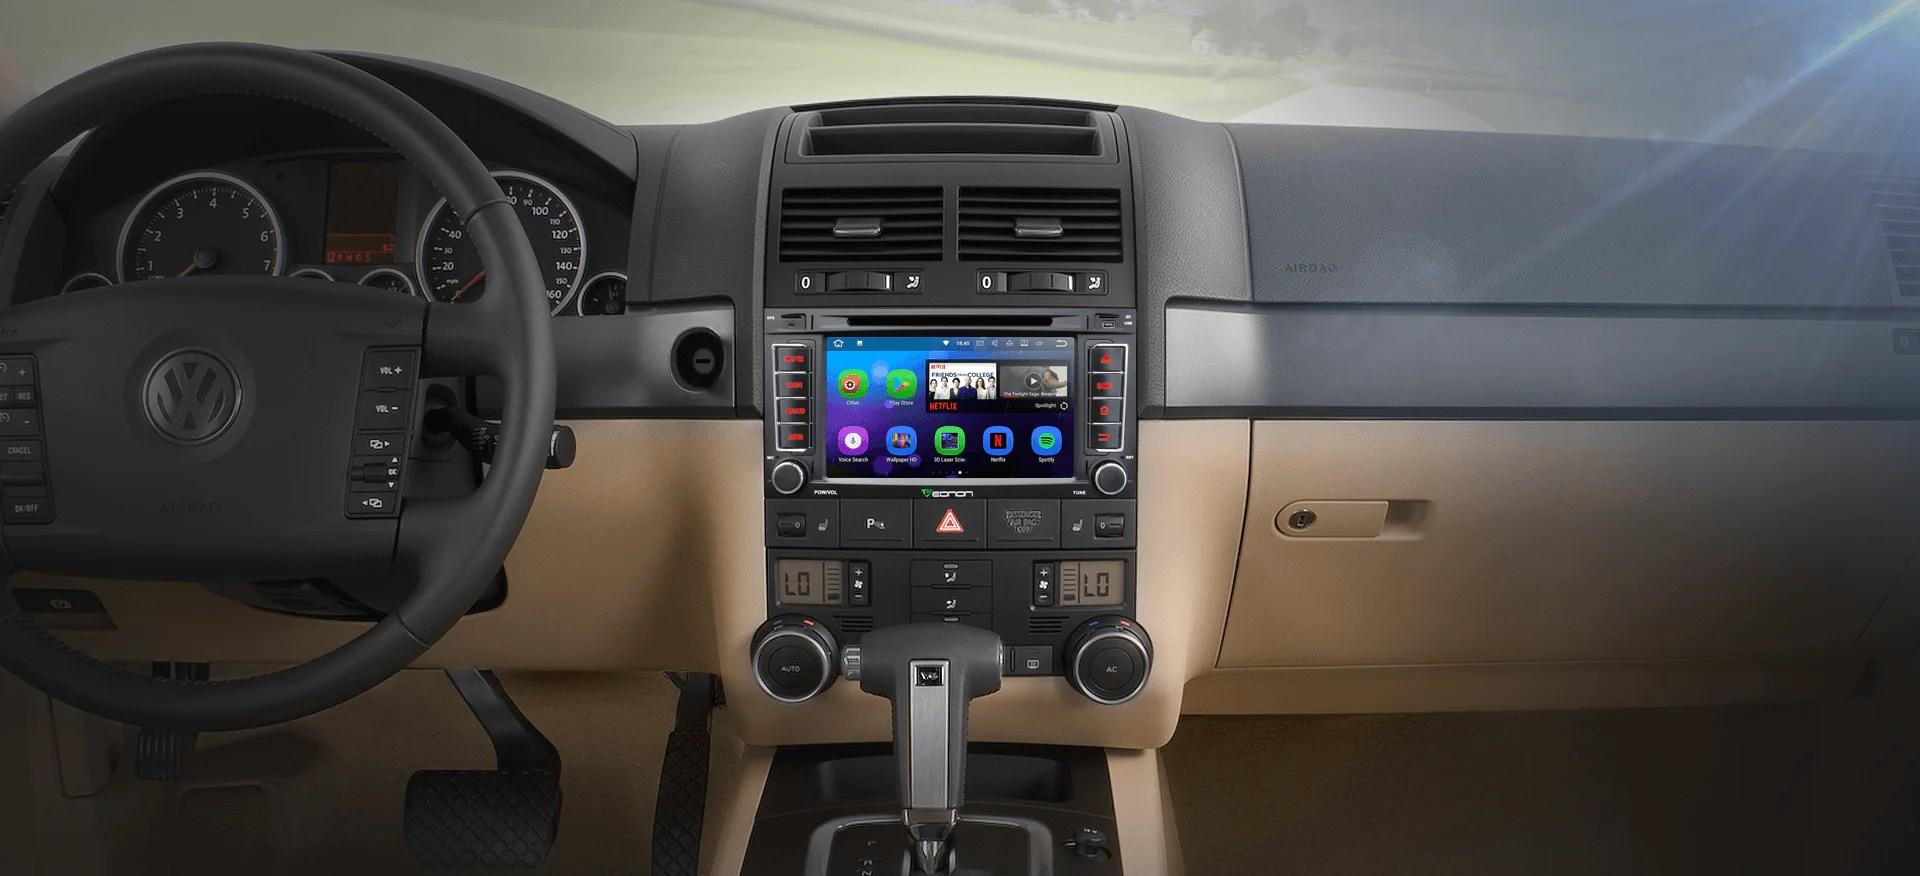 volkswagen vw touareg transporter 7 digital touch screen android ios multimedia car dvd gps [ 1920 x 876 Pixel ]